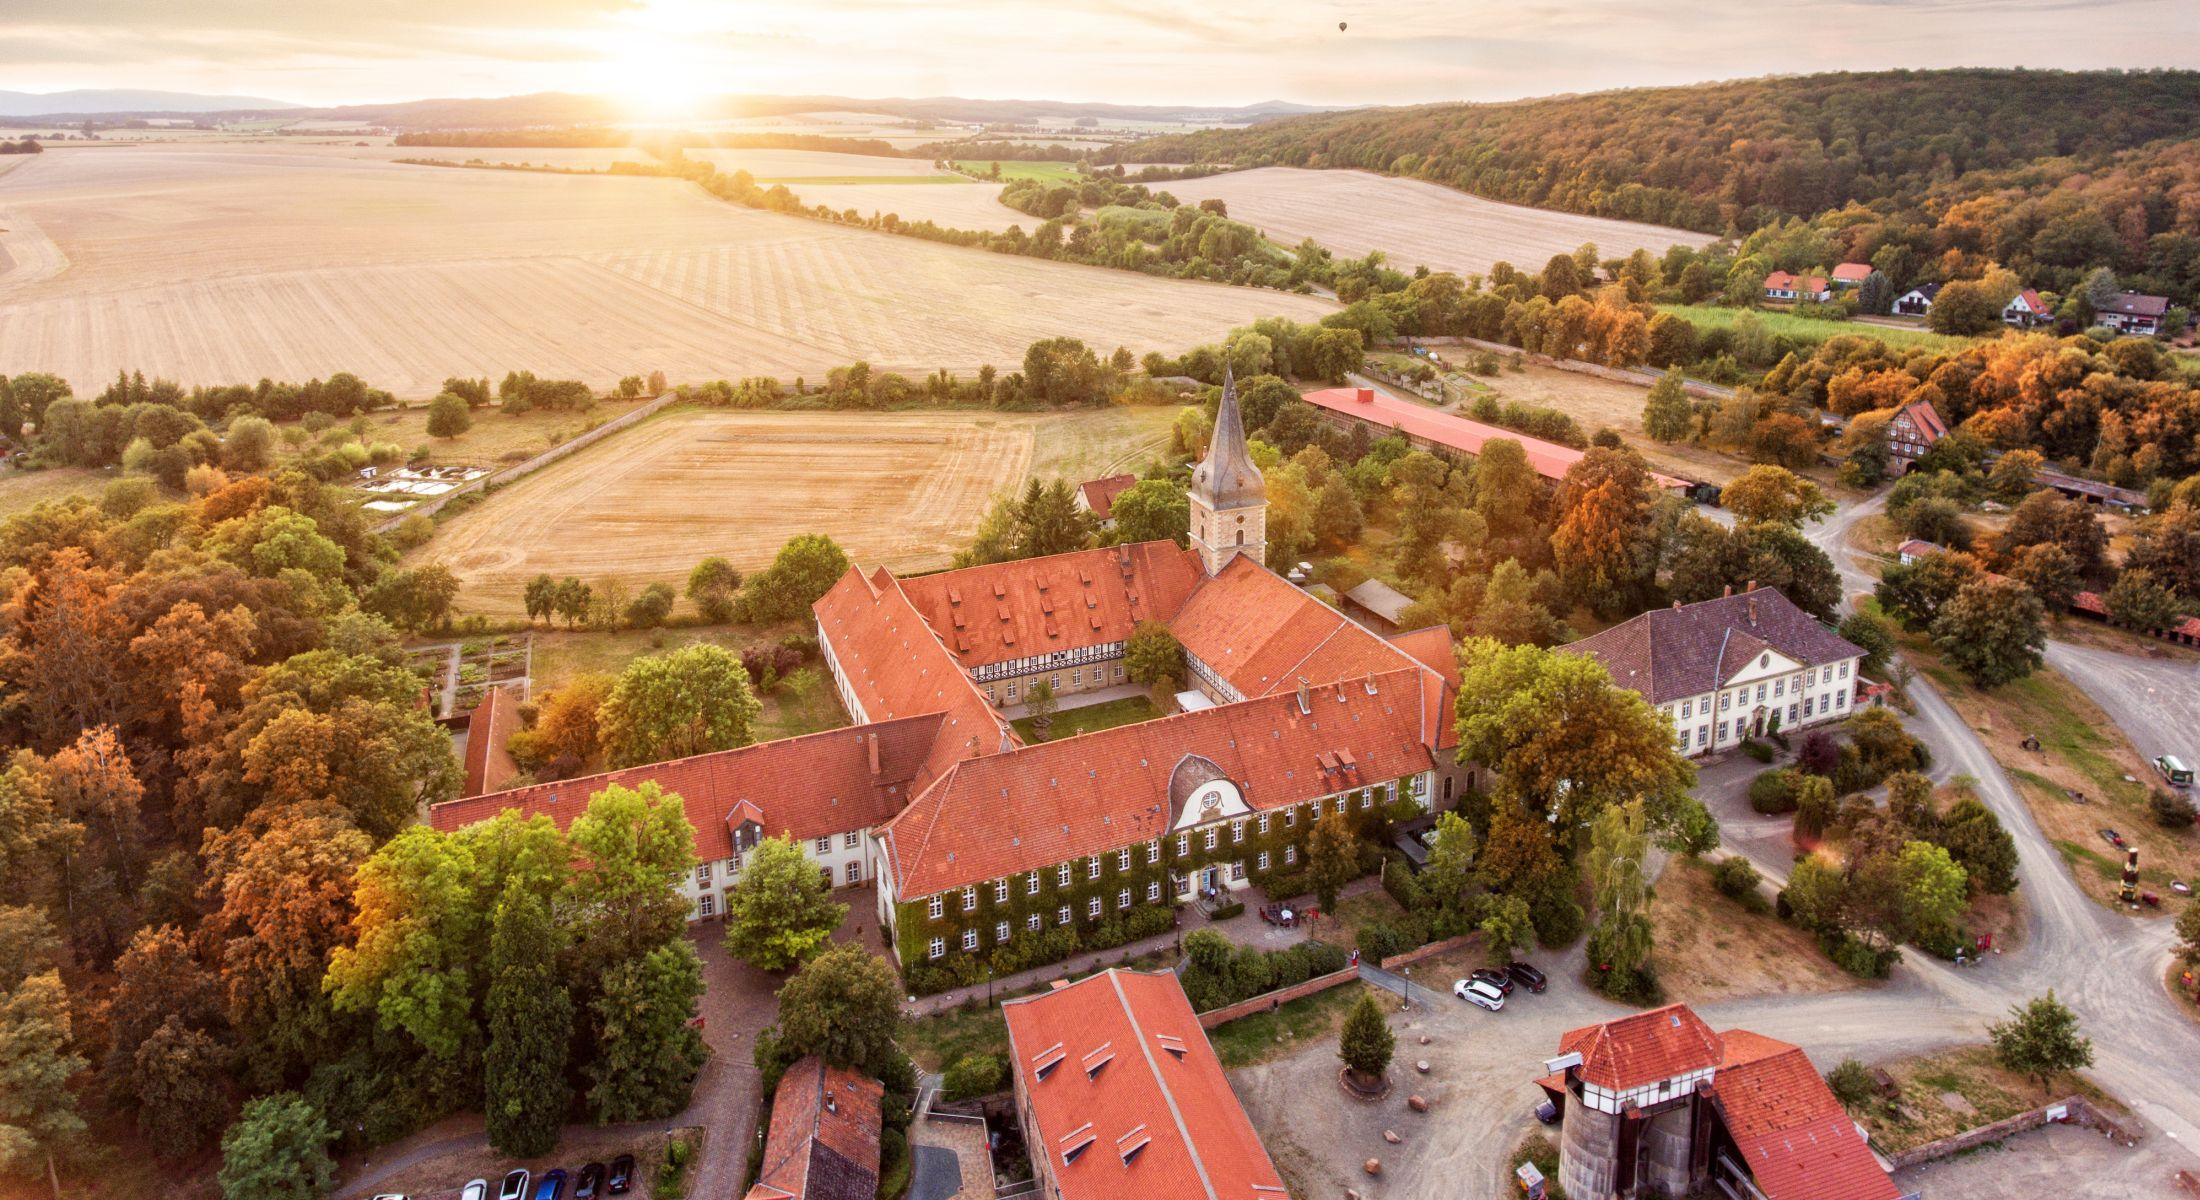 klosterhotel Wöltingerode